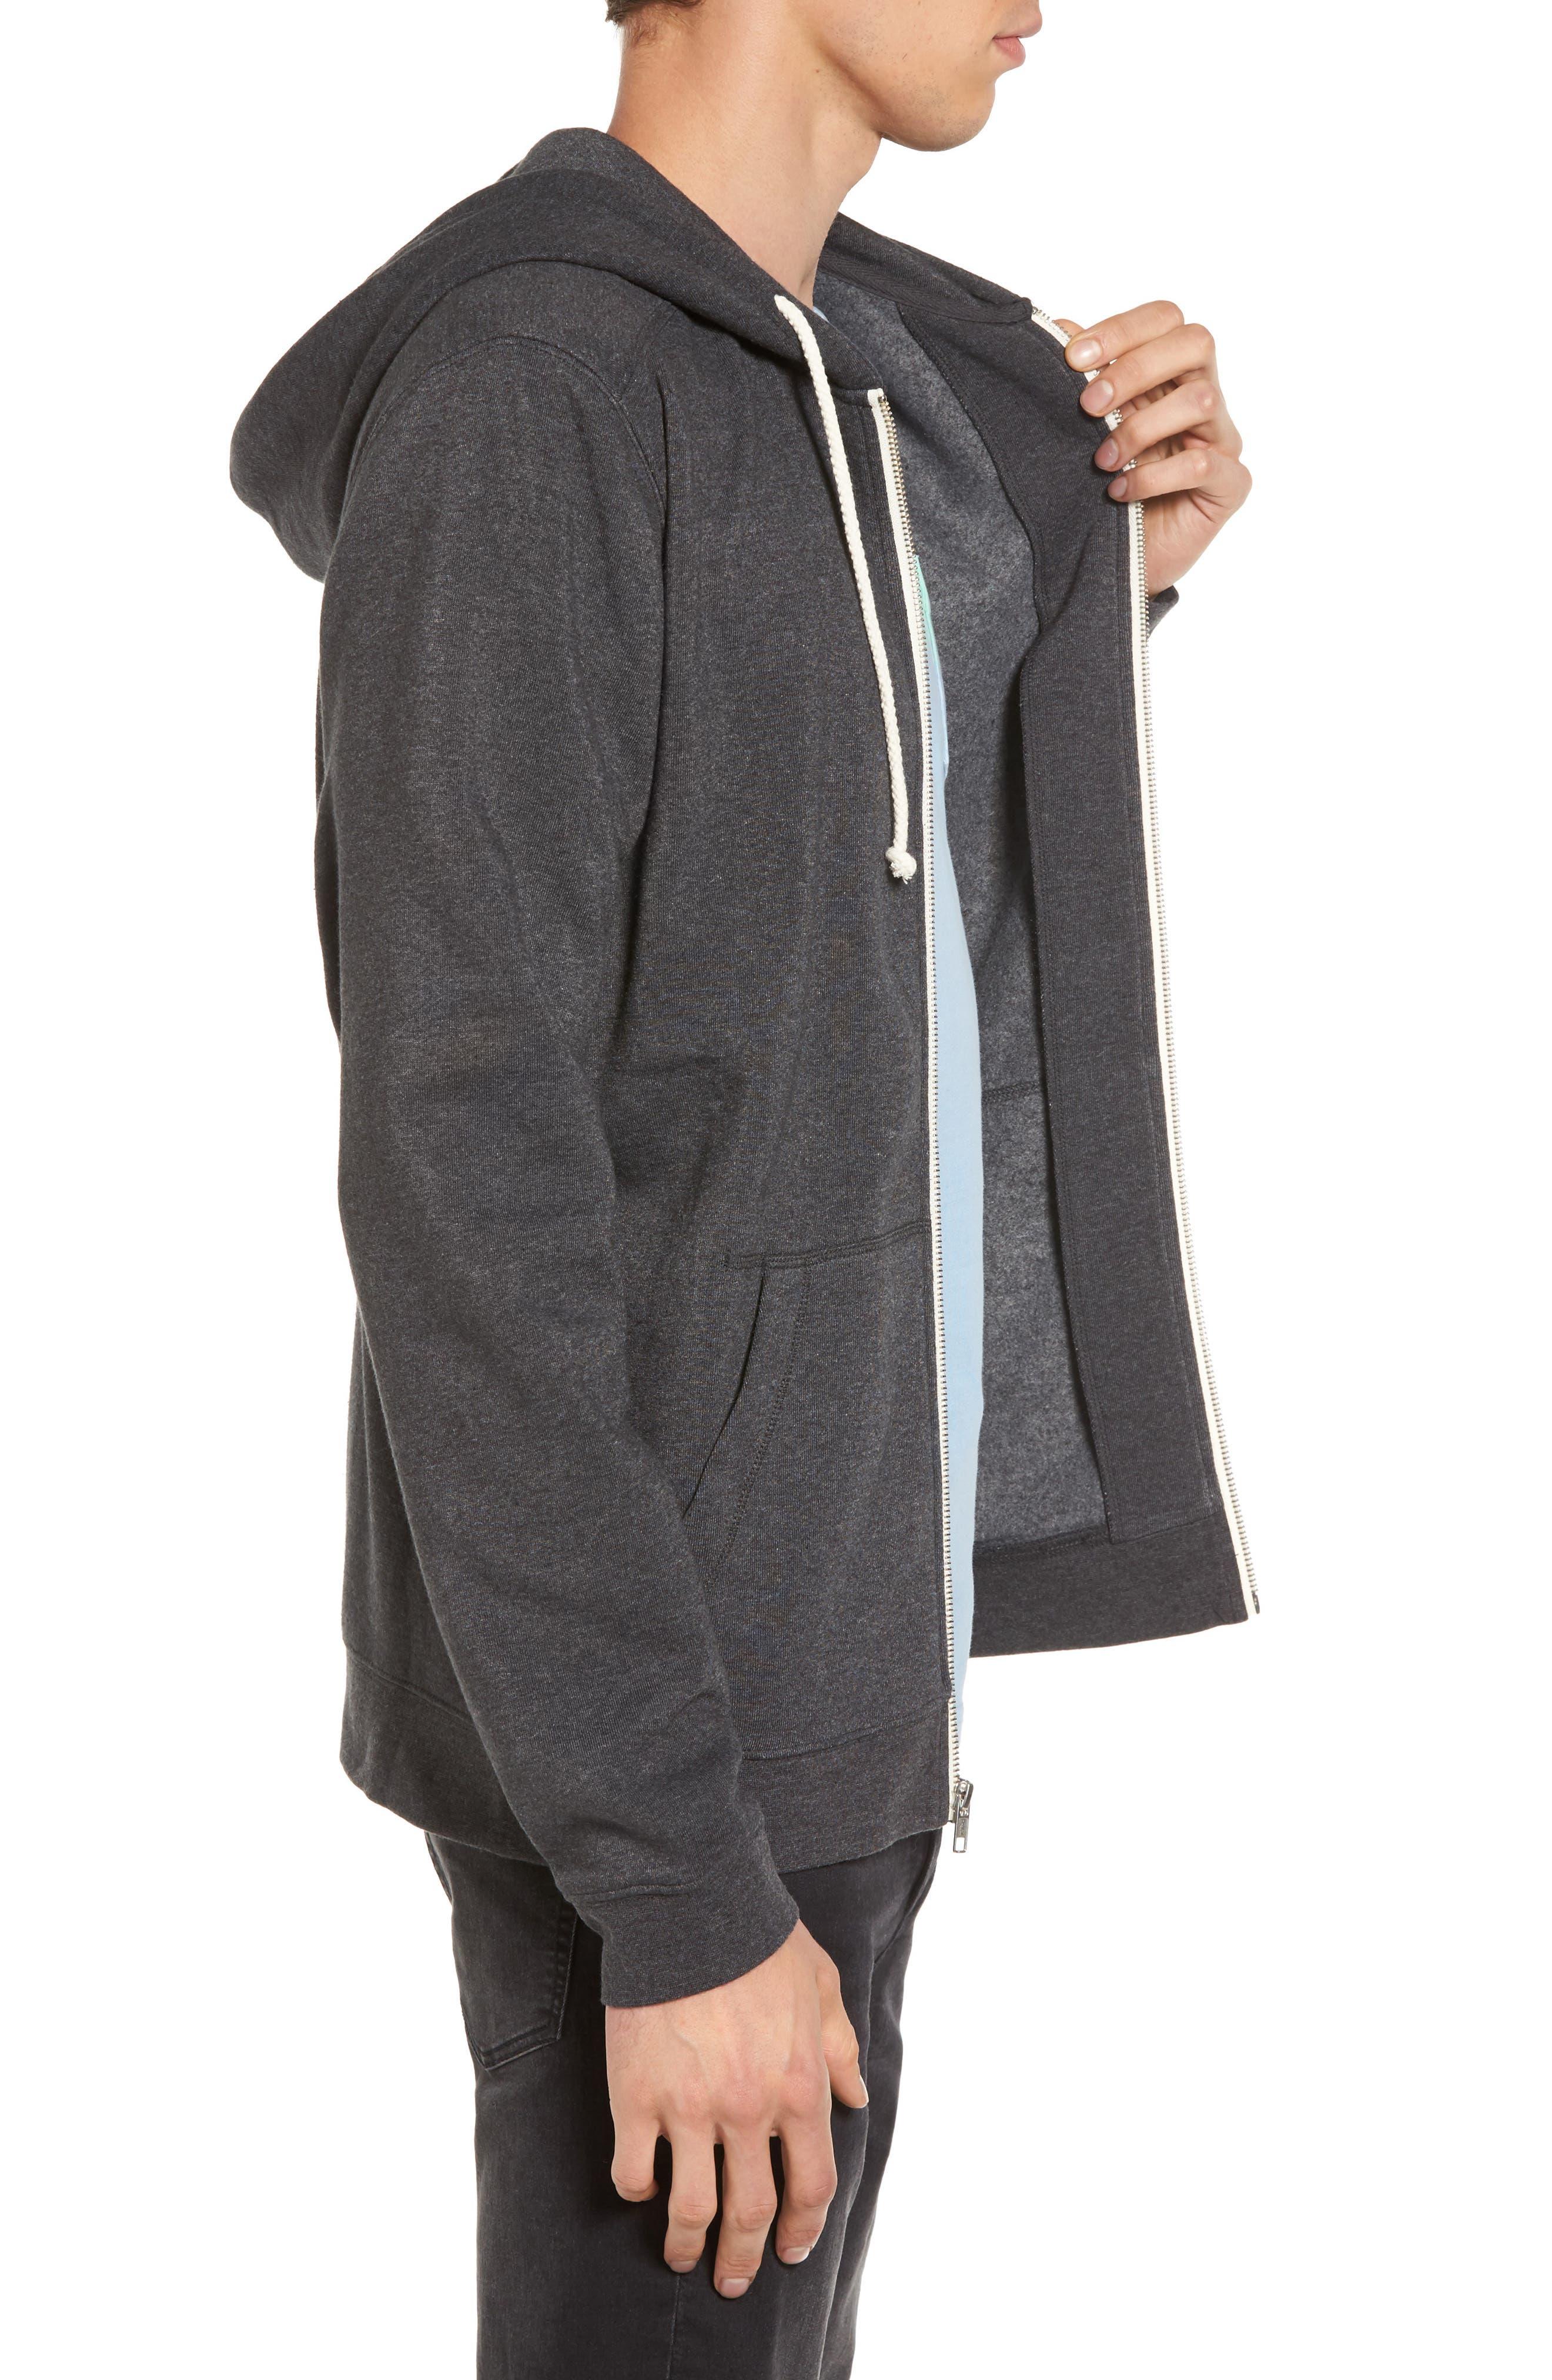 Fleece Zip Hoodie,                             Alternate thumbnail 3, color,                             Grey Charcoal Heather